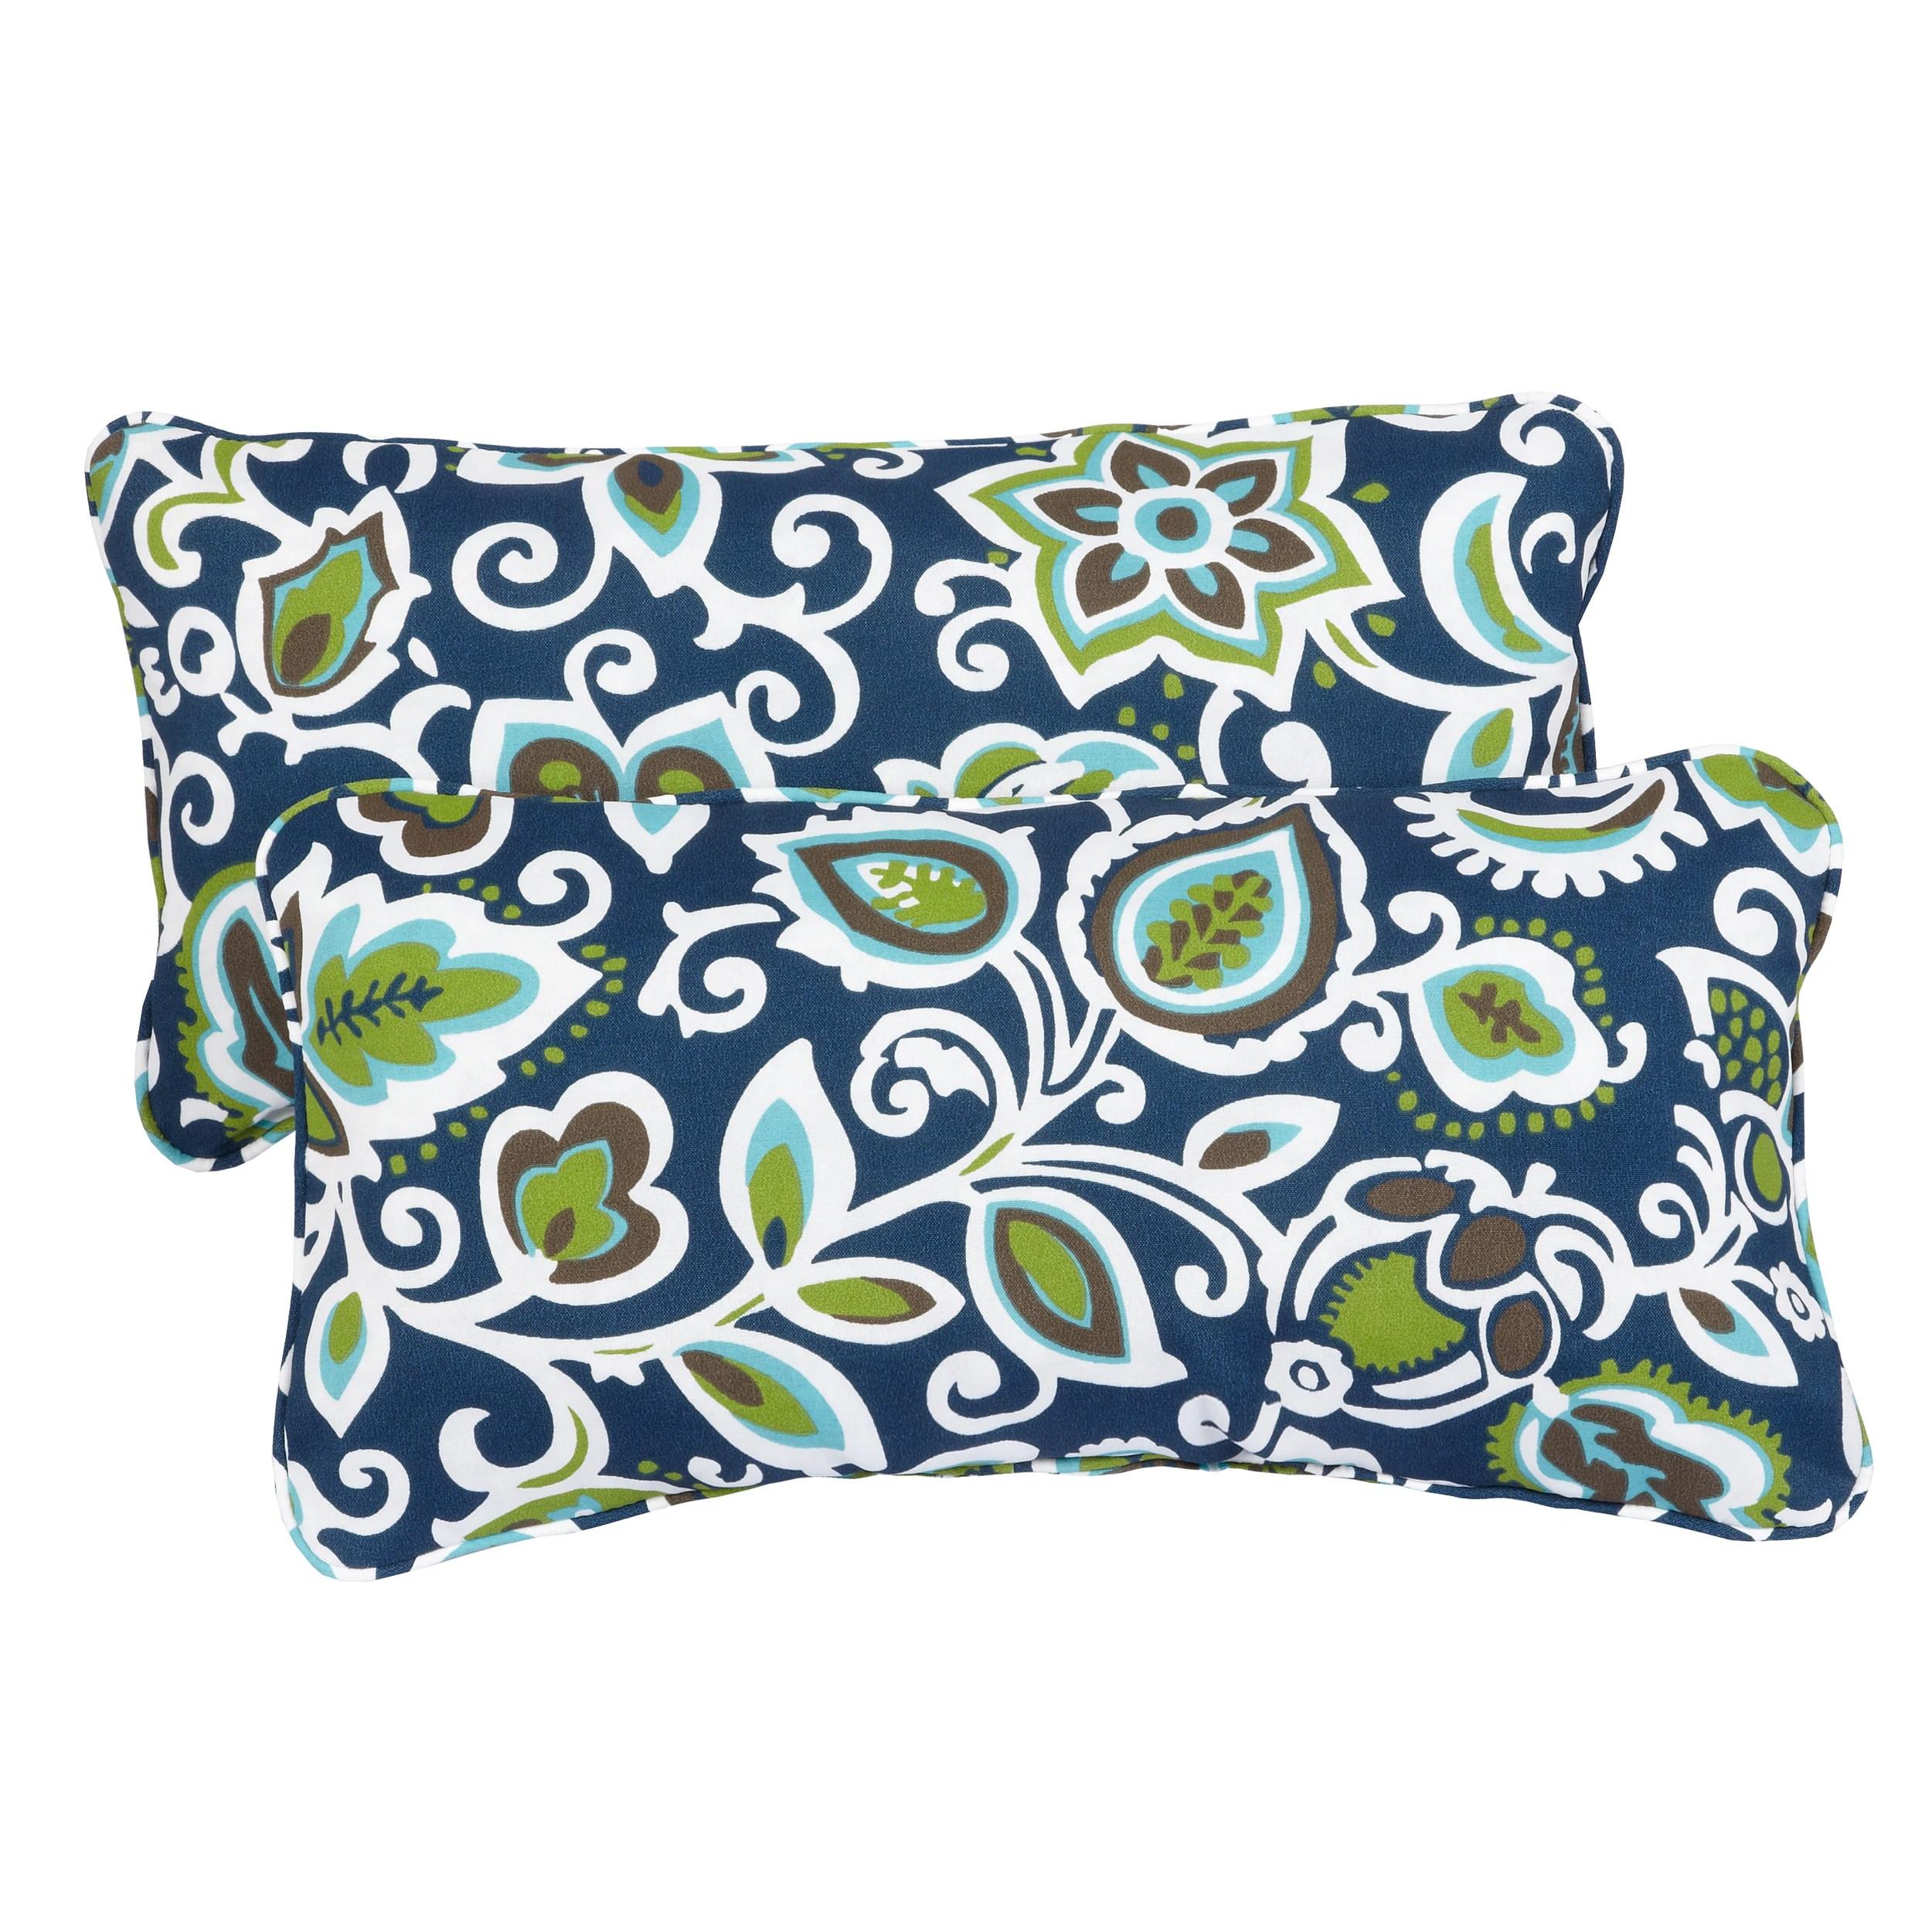 floral navy corded 12 x 24 inch indoor outdoor lumbar pillows set of 2